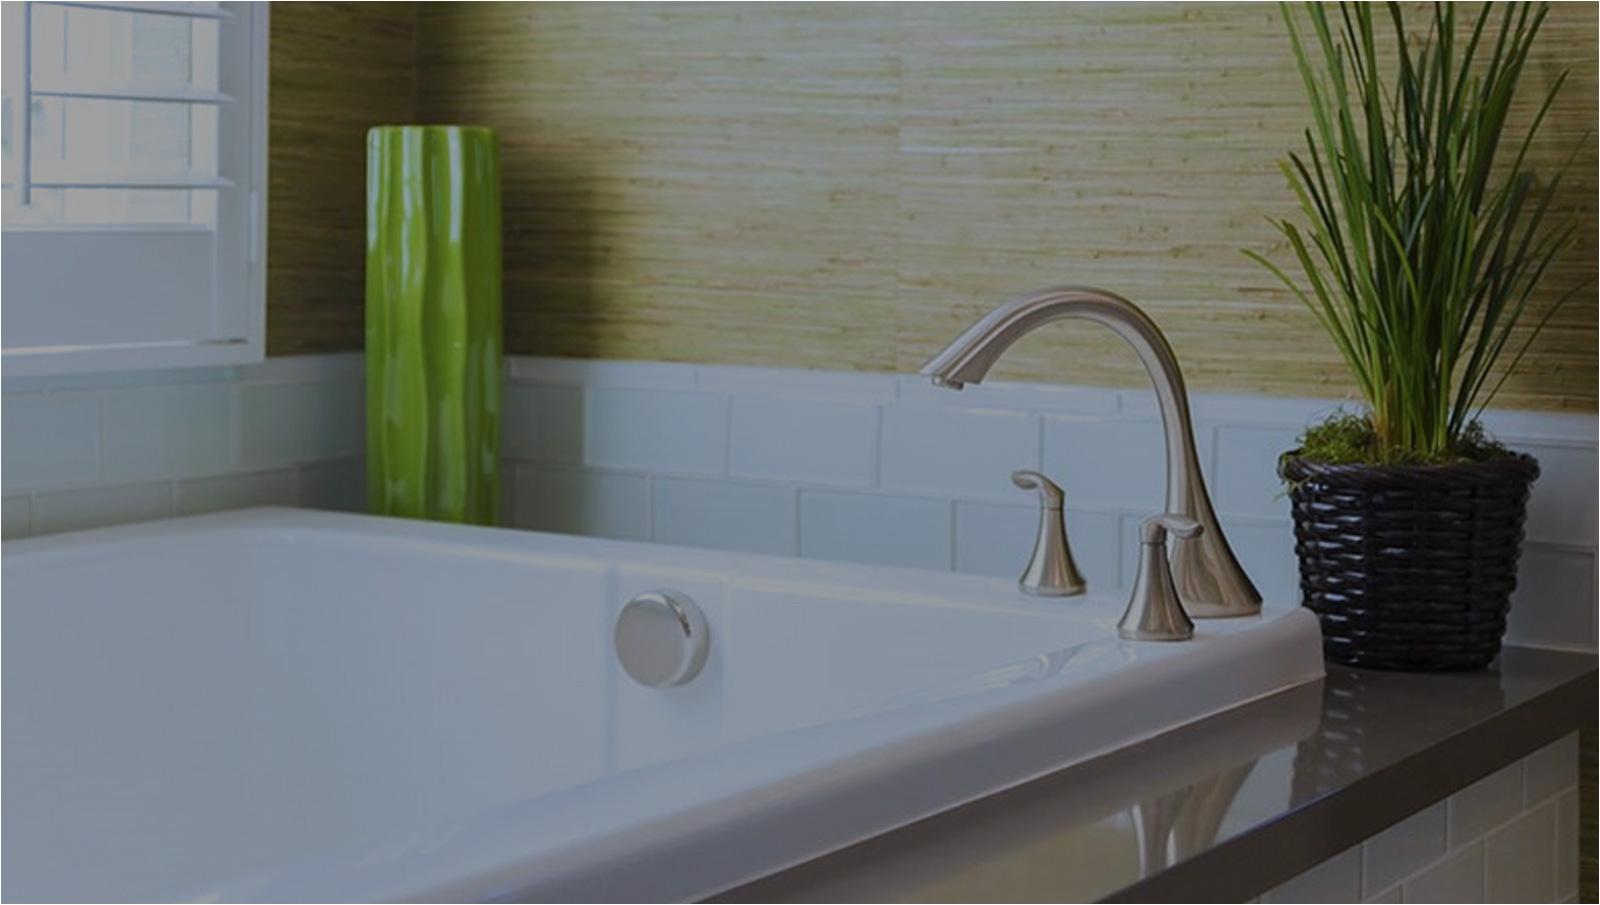 Bathtub Reglazing Yonkers Ny Ny Bathtub Reglazers New York Bathtub & Tile Refinishing